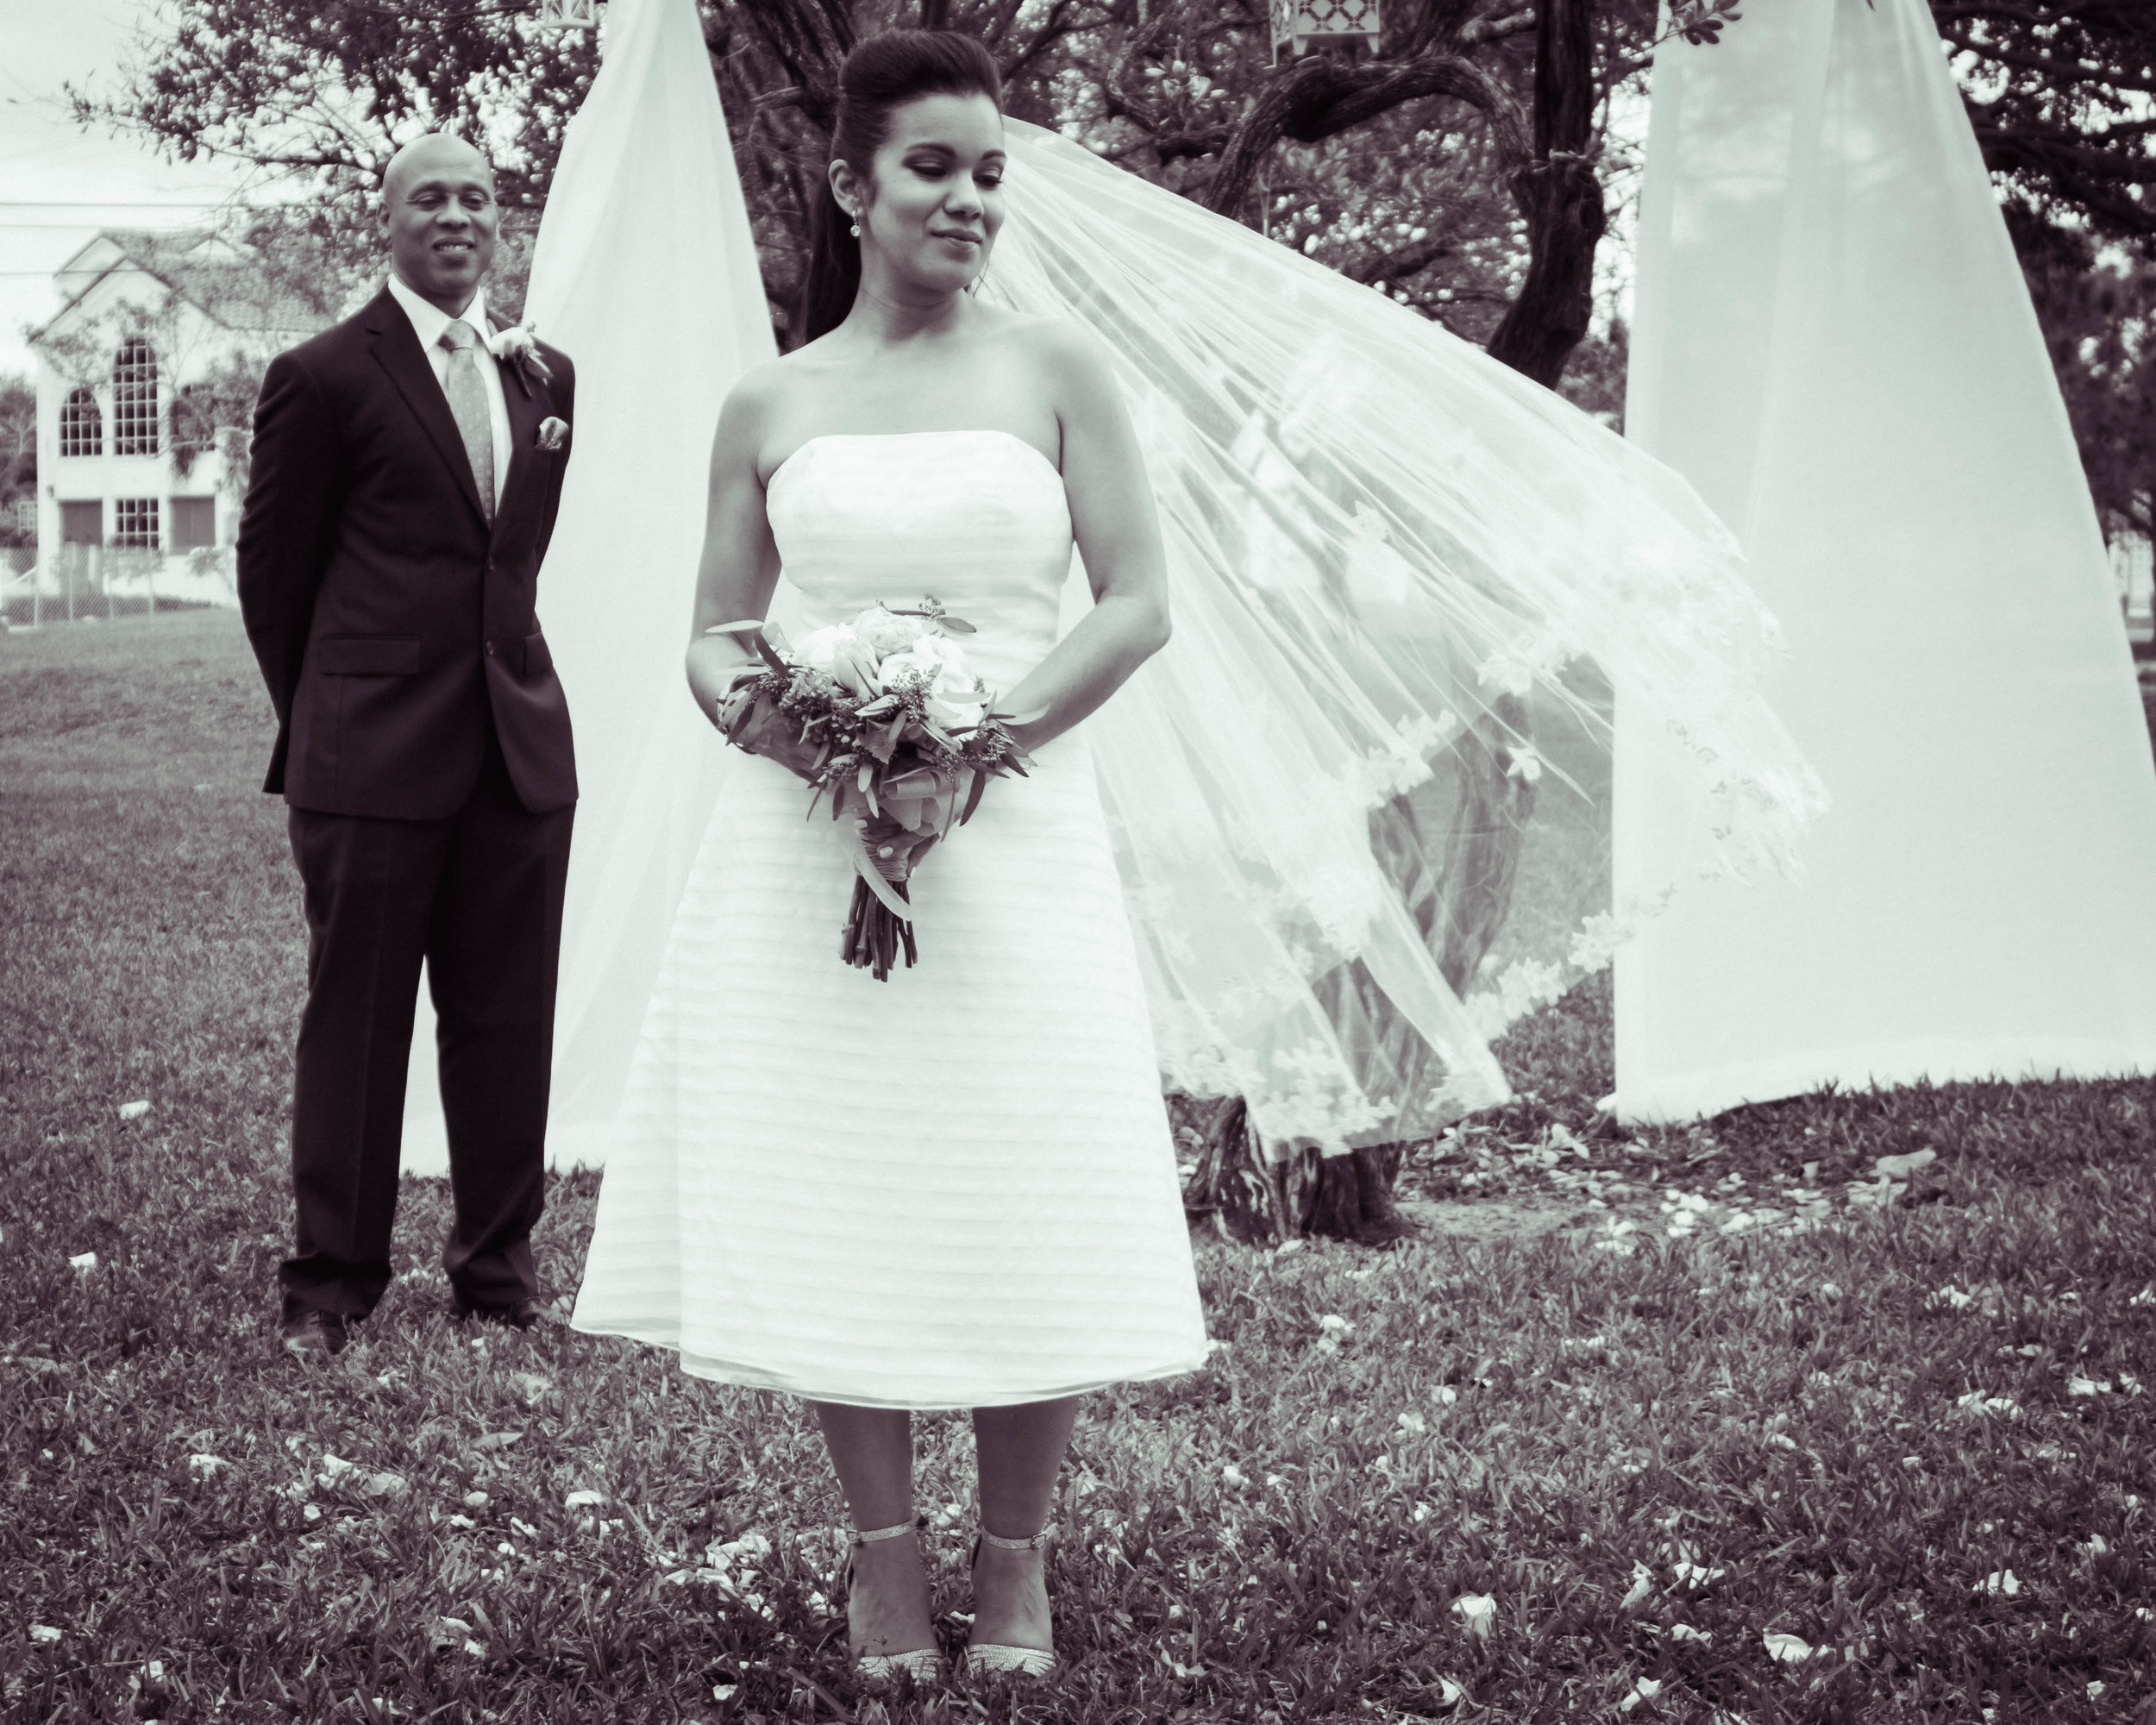 Tina_Mestre_Photography_Jas_Wedding_4.jpg